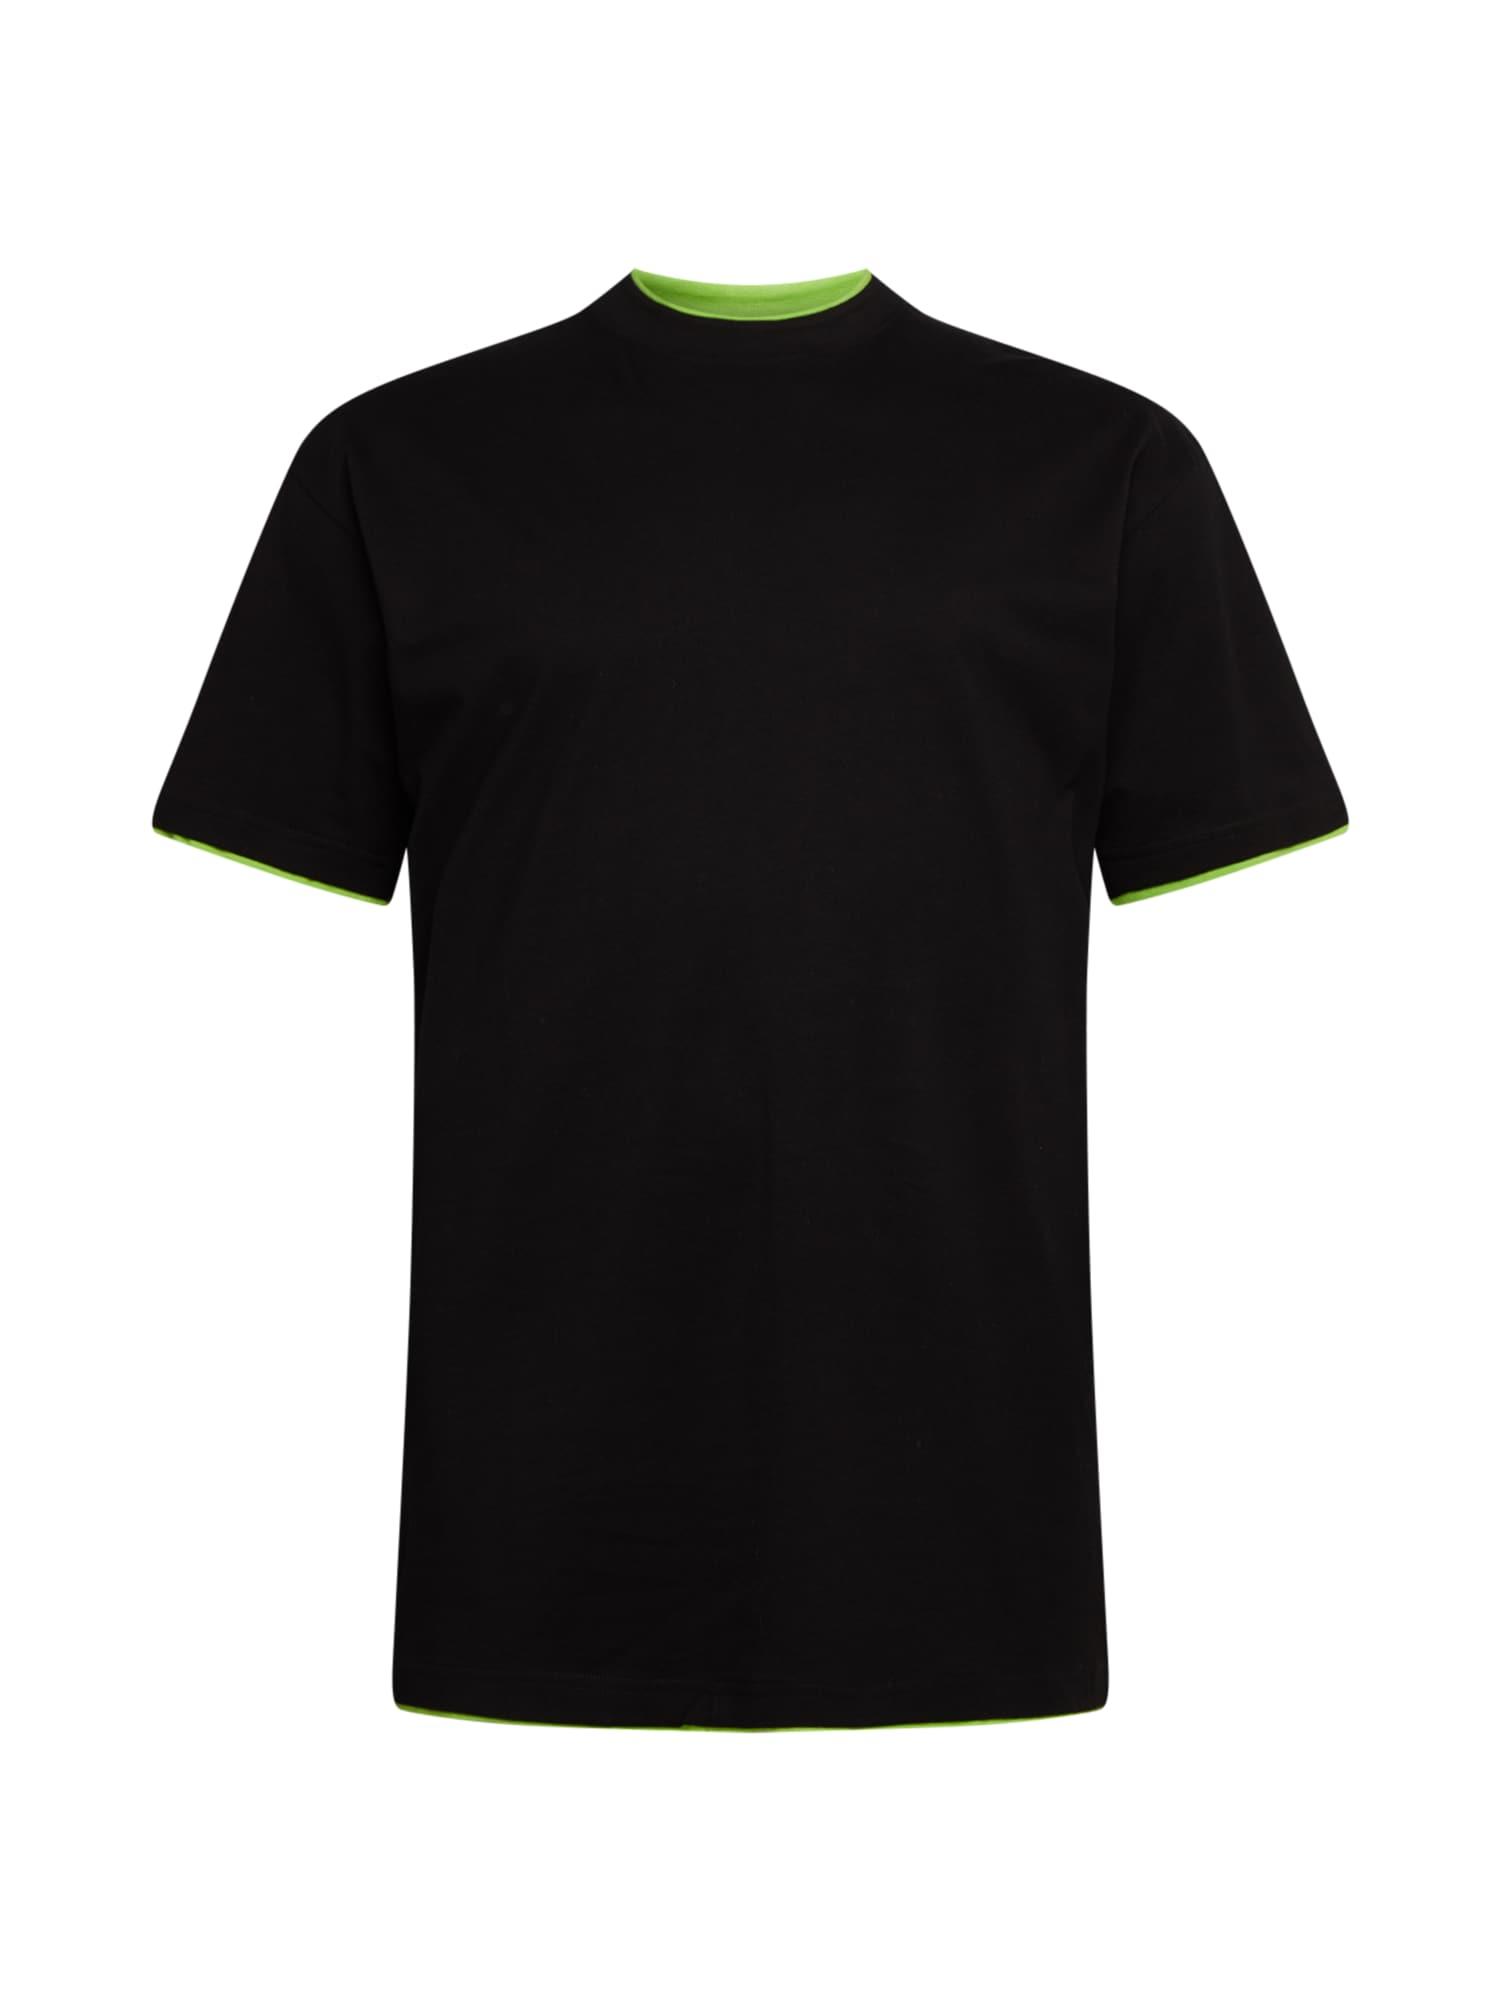 Urban Classics Big & Tall T-Shirt 'Contrast'  - Noir - Taille: XXXL - male